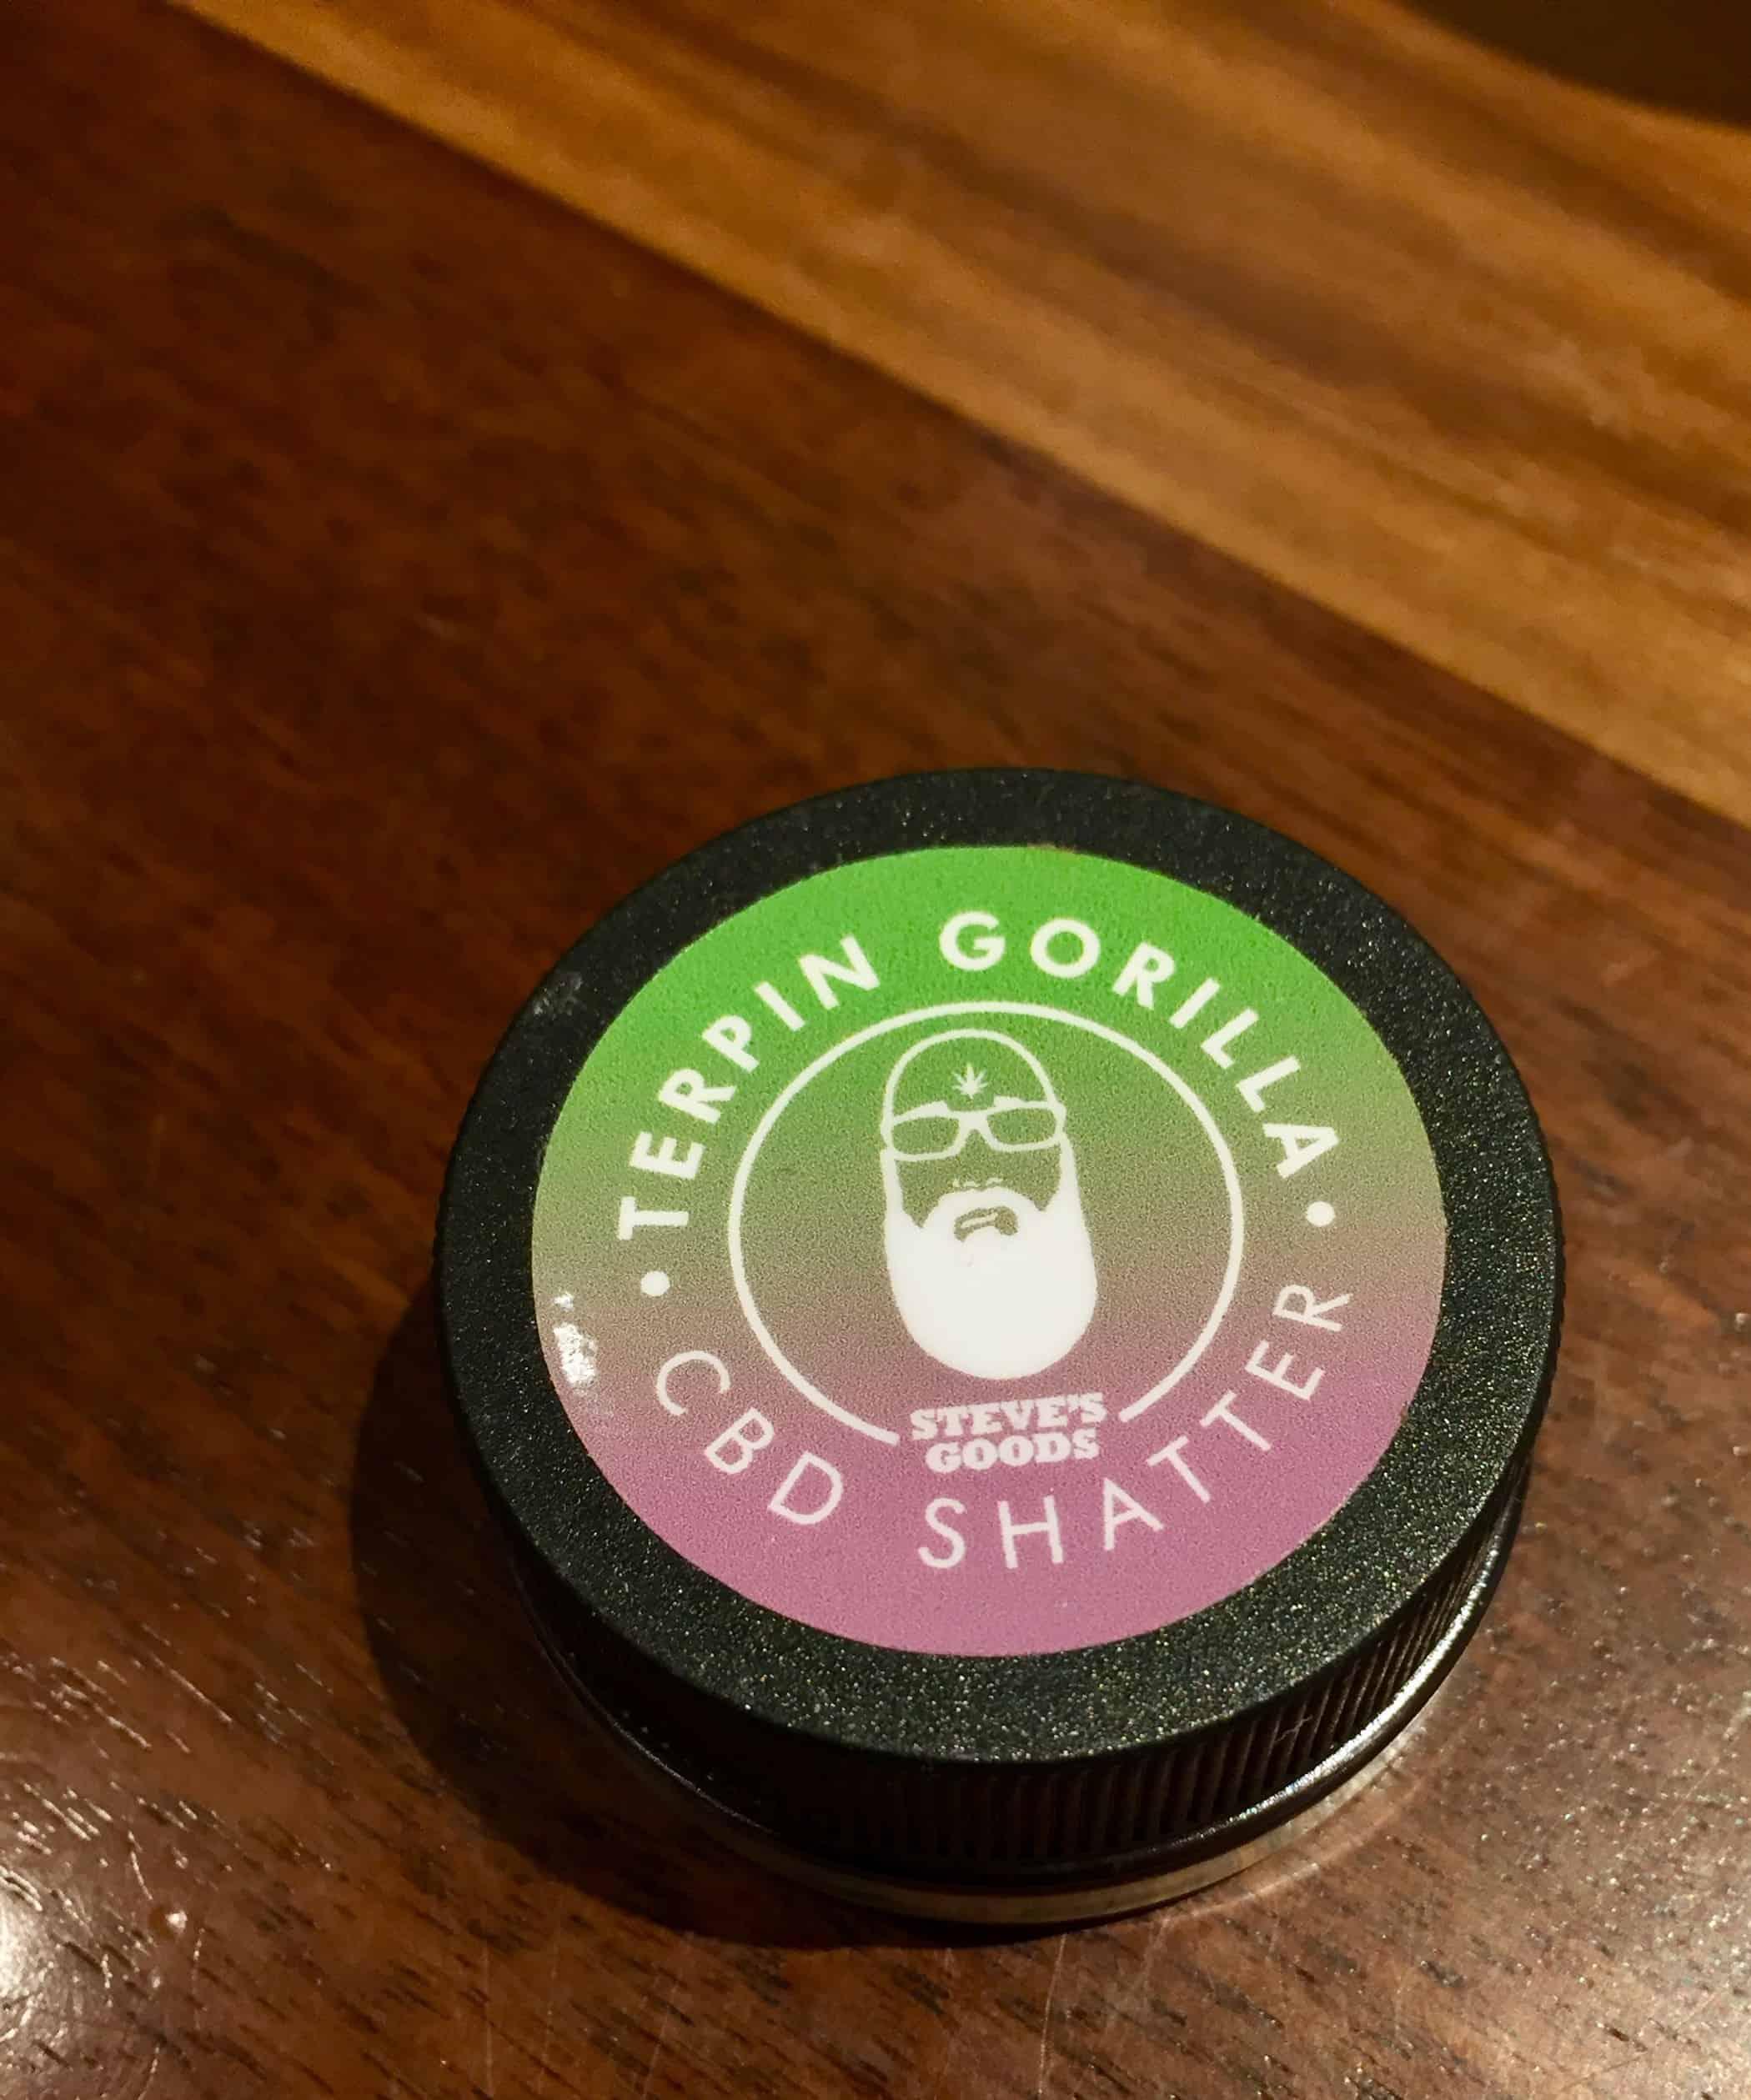 steves goods terpin gorilla cbd shatter 1 g Save On Cannabis review